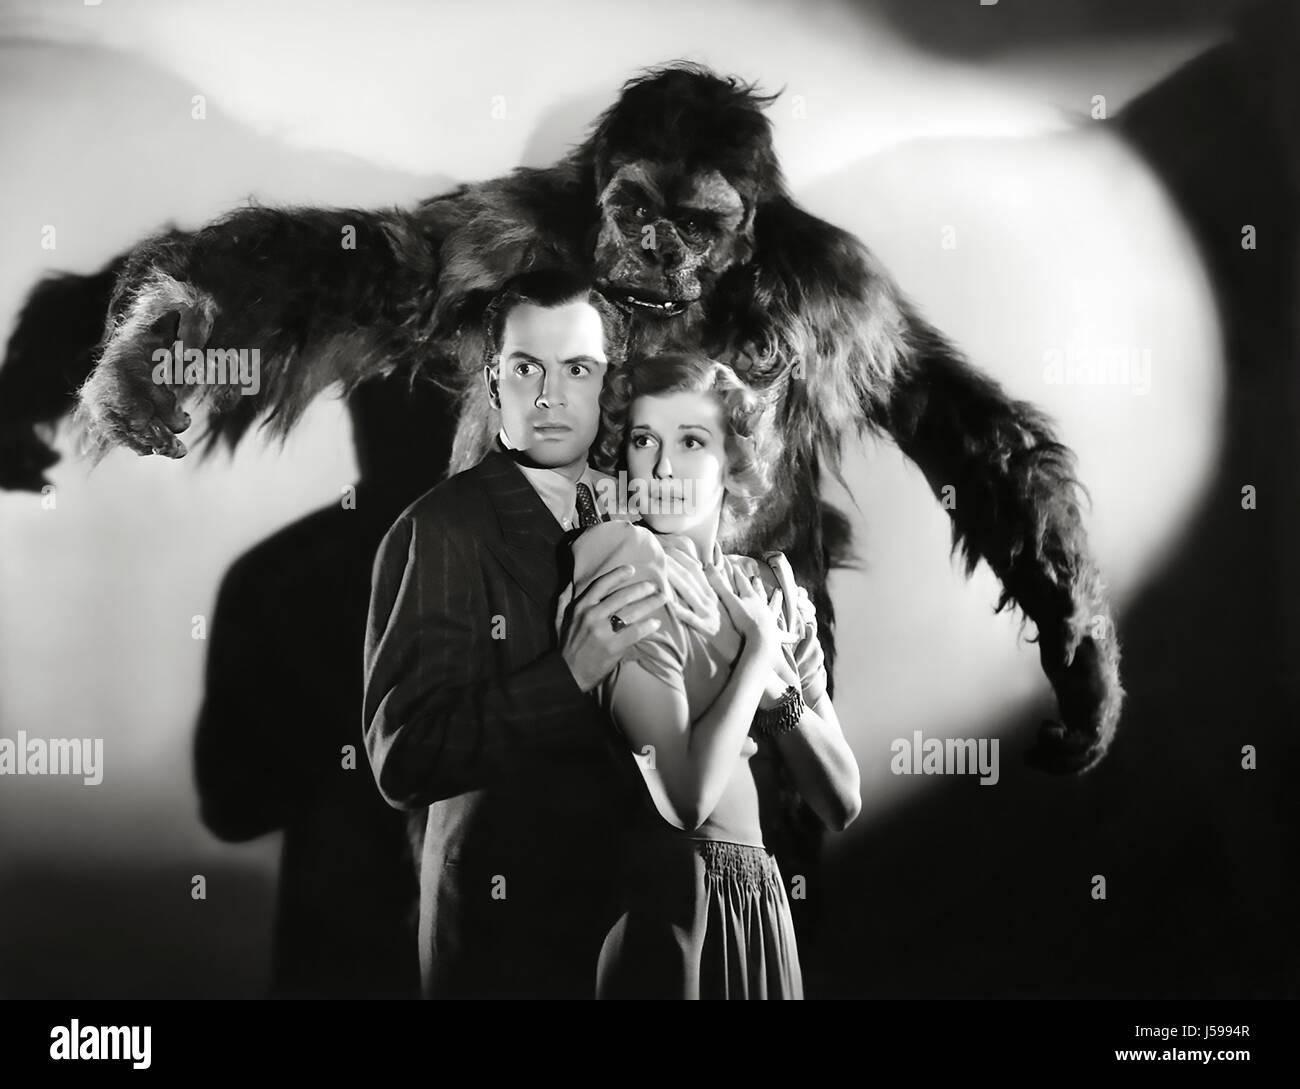 THE GORILLA 1939 20th Century Fox film with Anita Louise, Edward Norris and Art Miles as the Gorilla - Stock Image